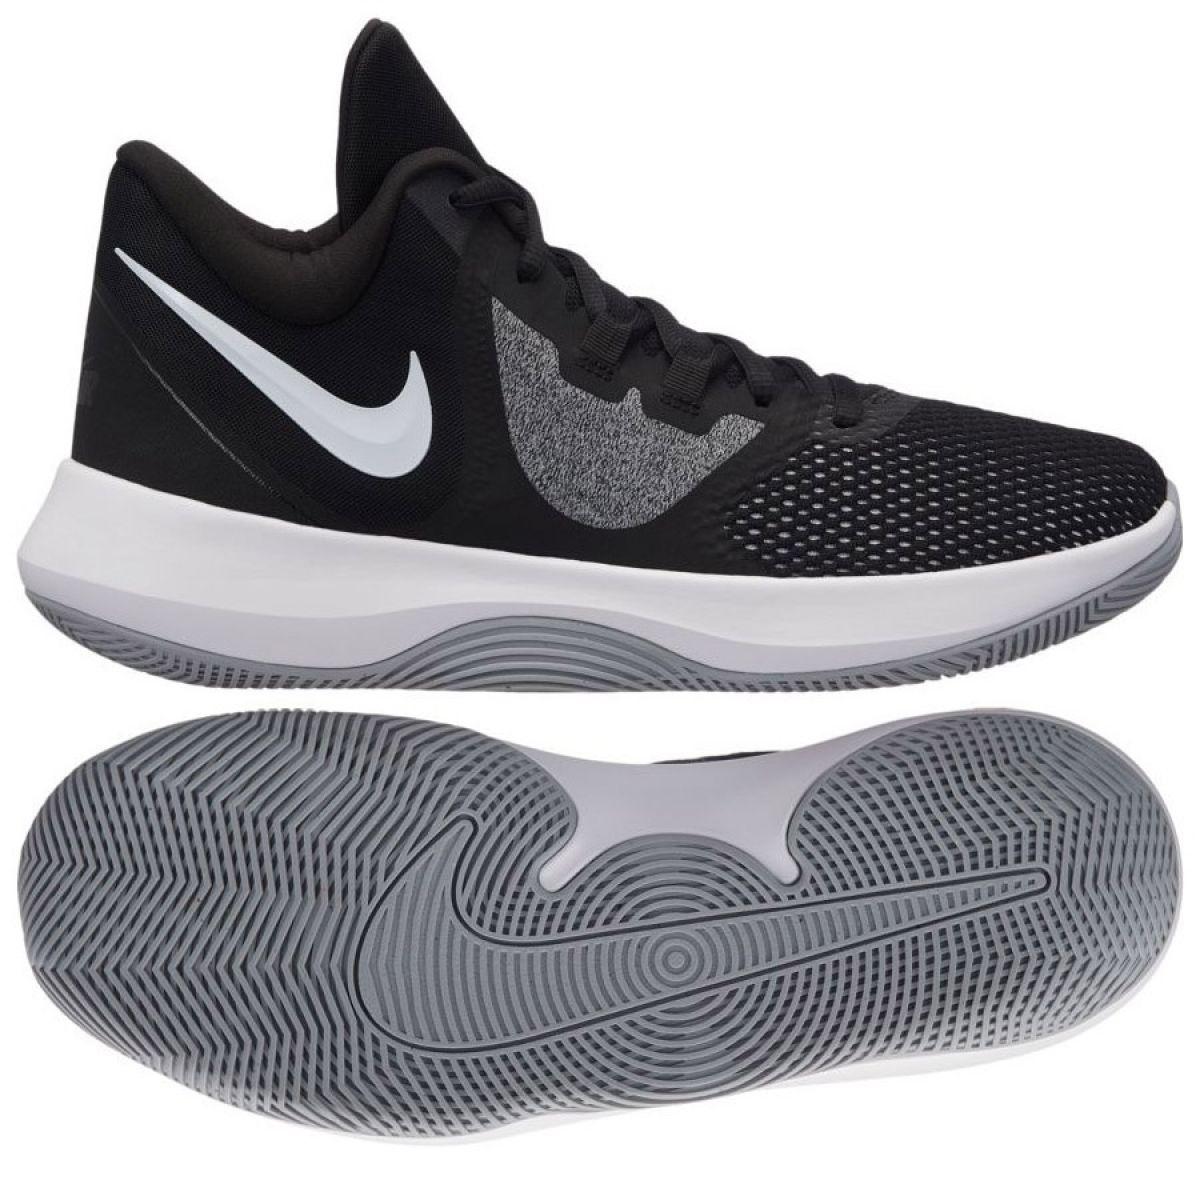 Tênis de basquete Nike Air Precision Ii M AA7069 001 preto preto